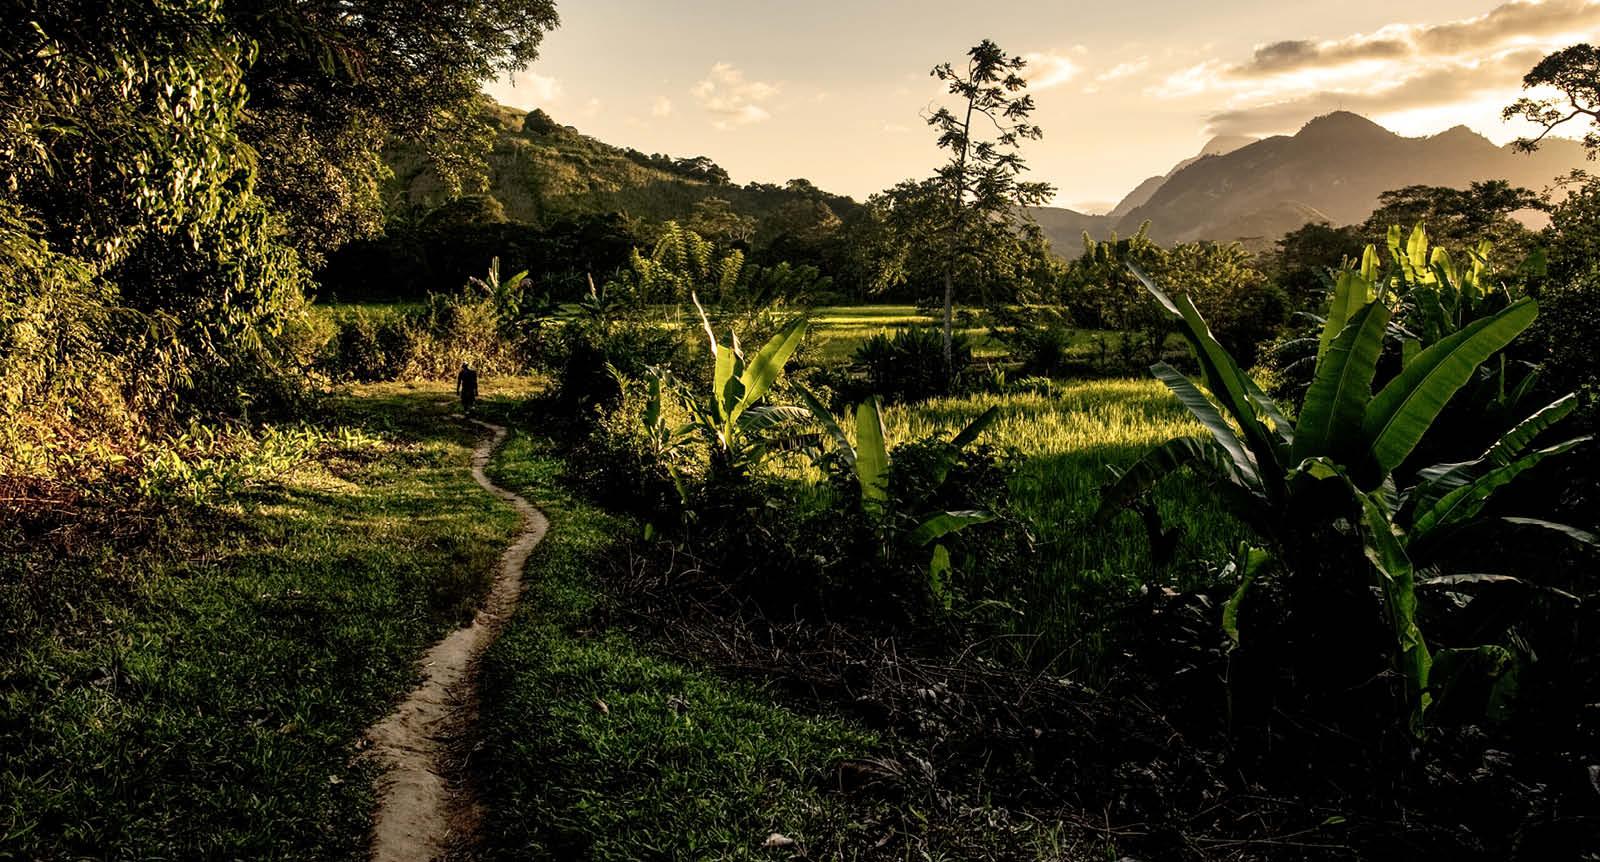 Madagascar jungle at dusk